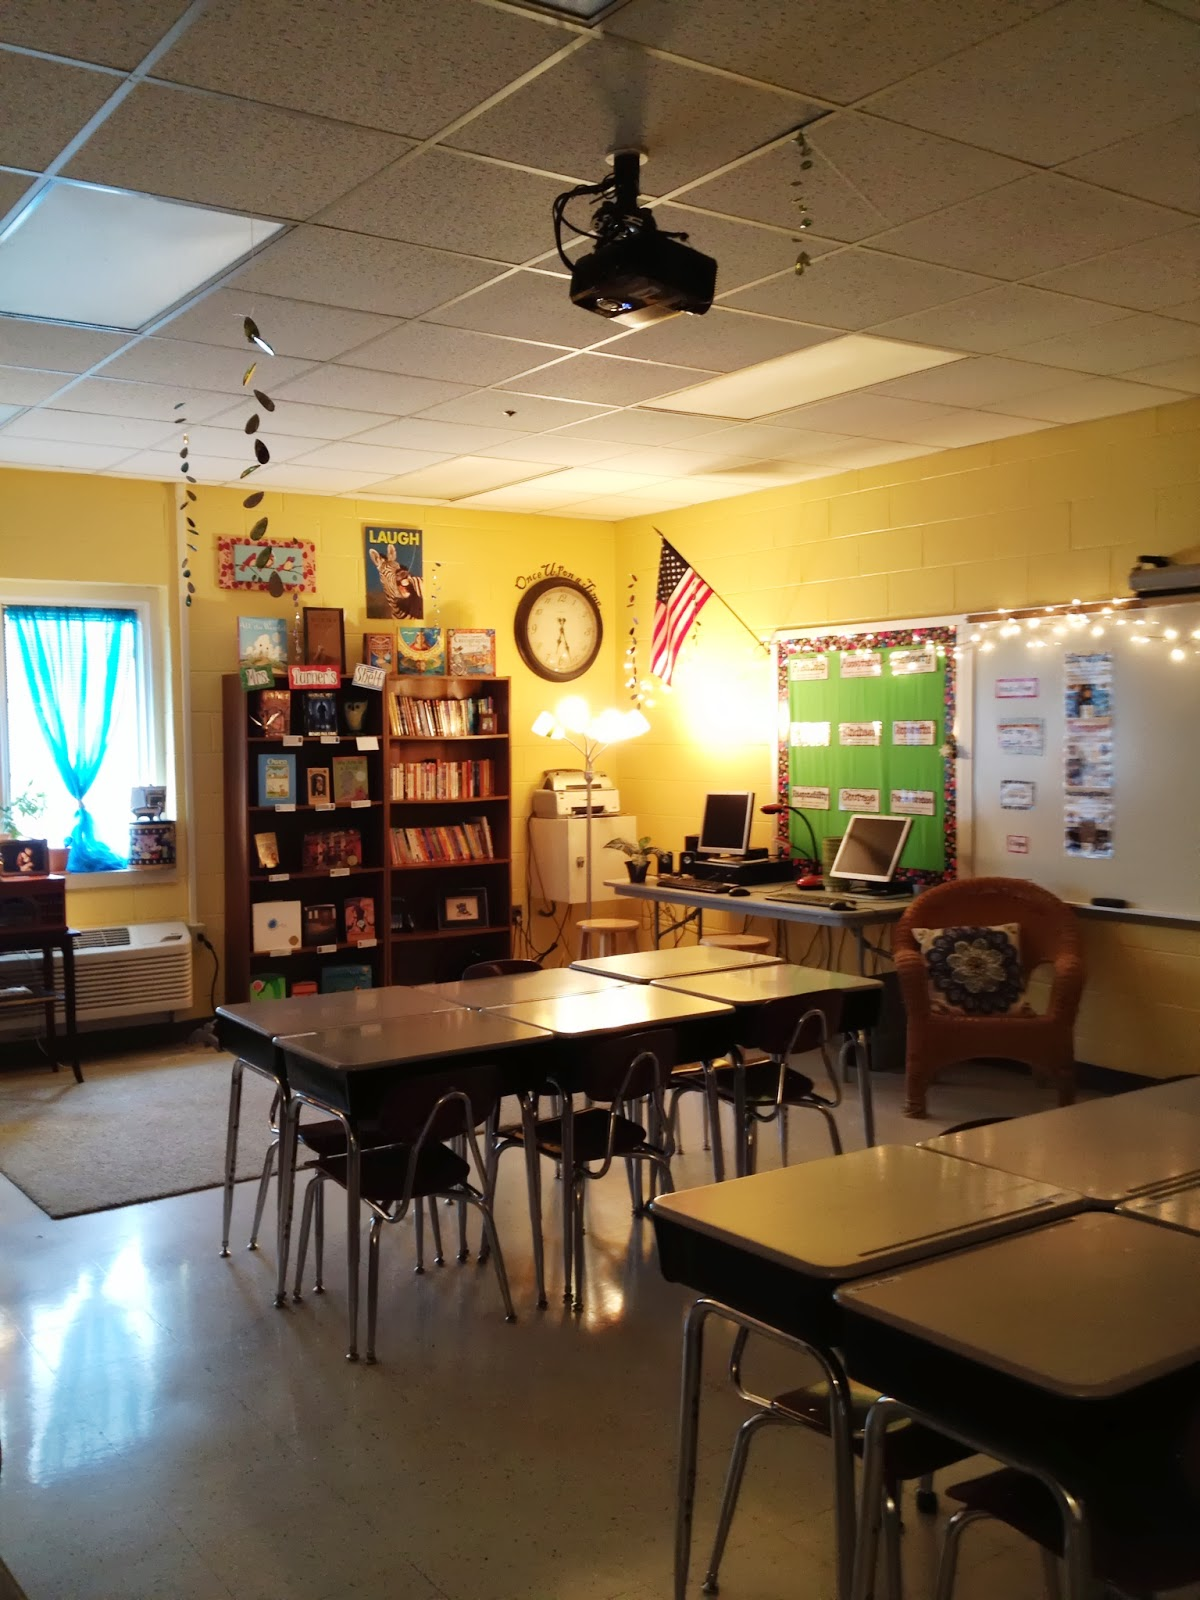 classroom - photo #27